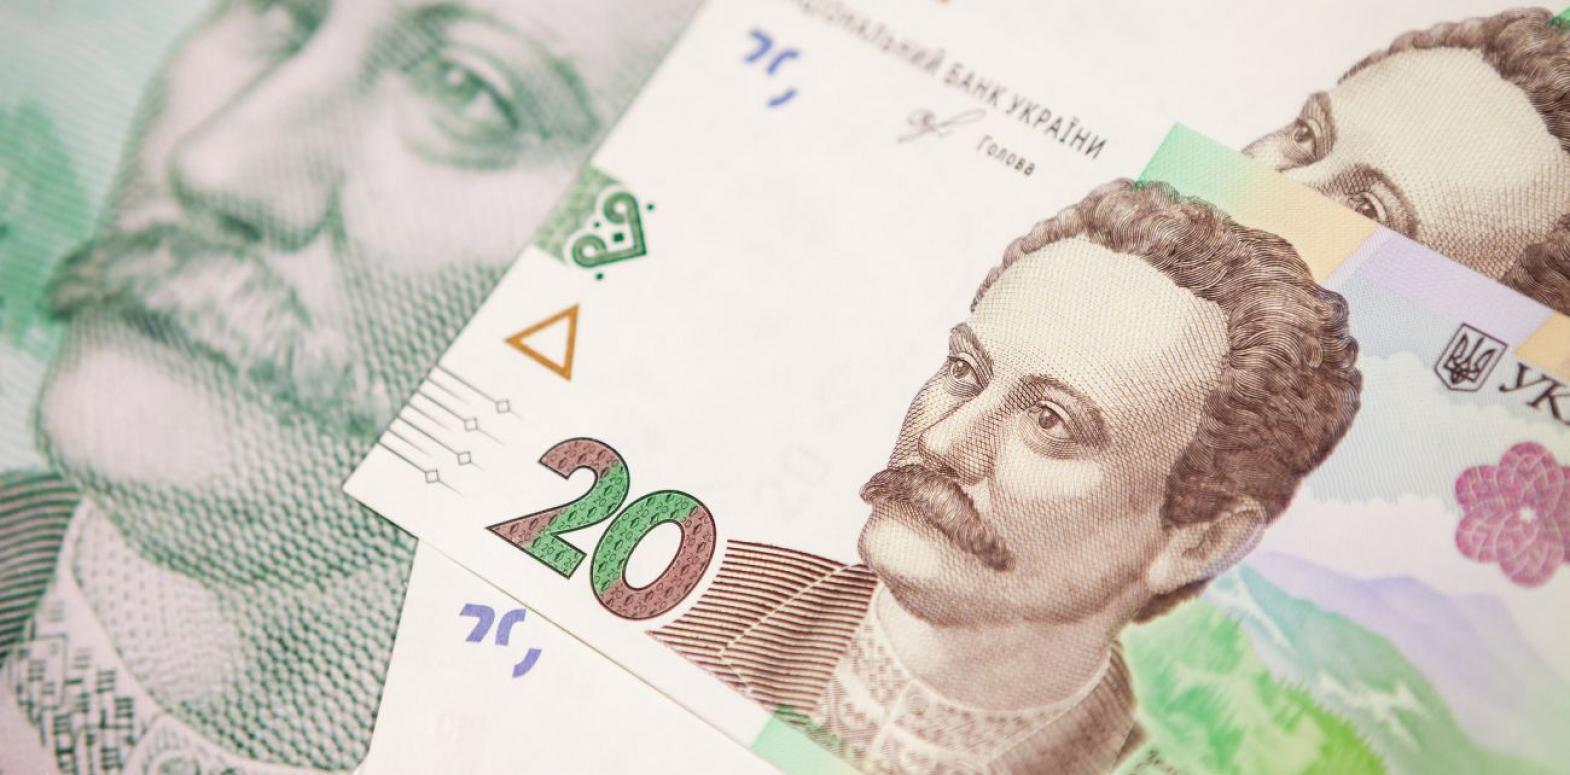 ПФУ назвал сумму выплаченных пенсий за последний месяц